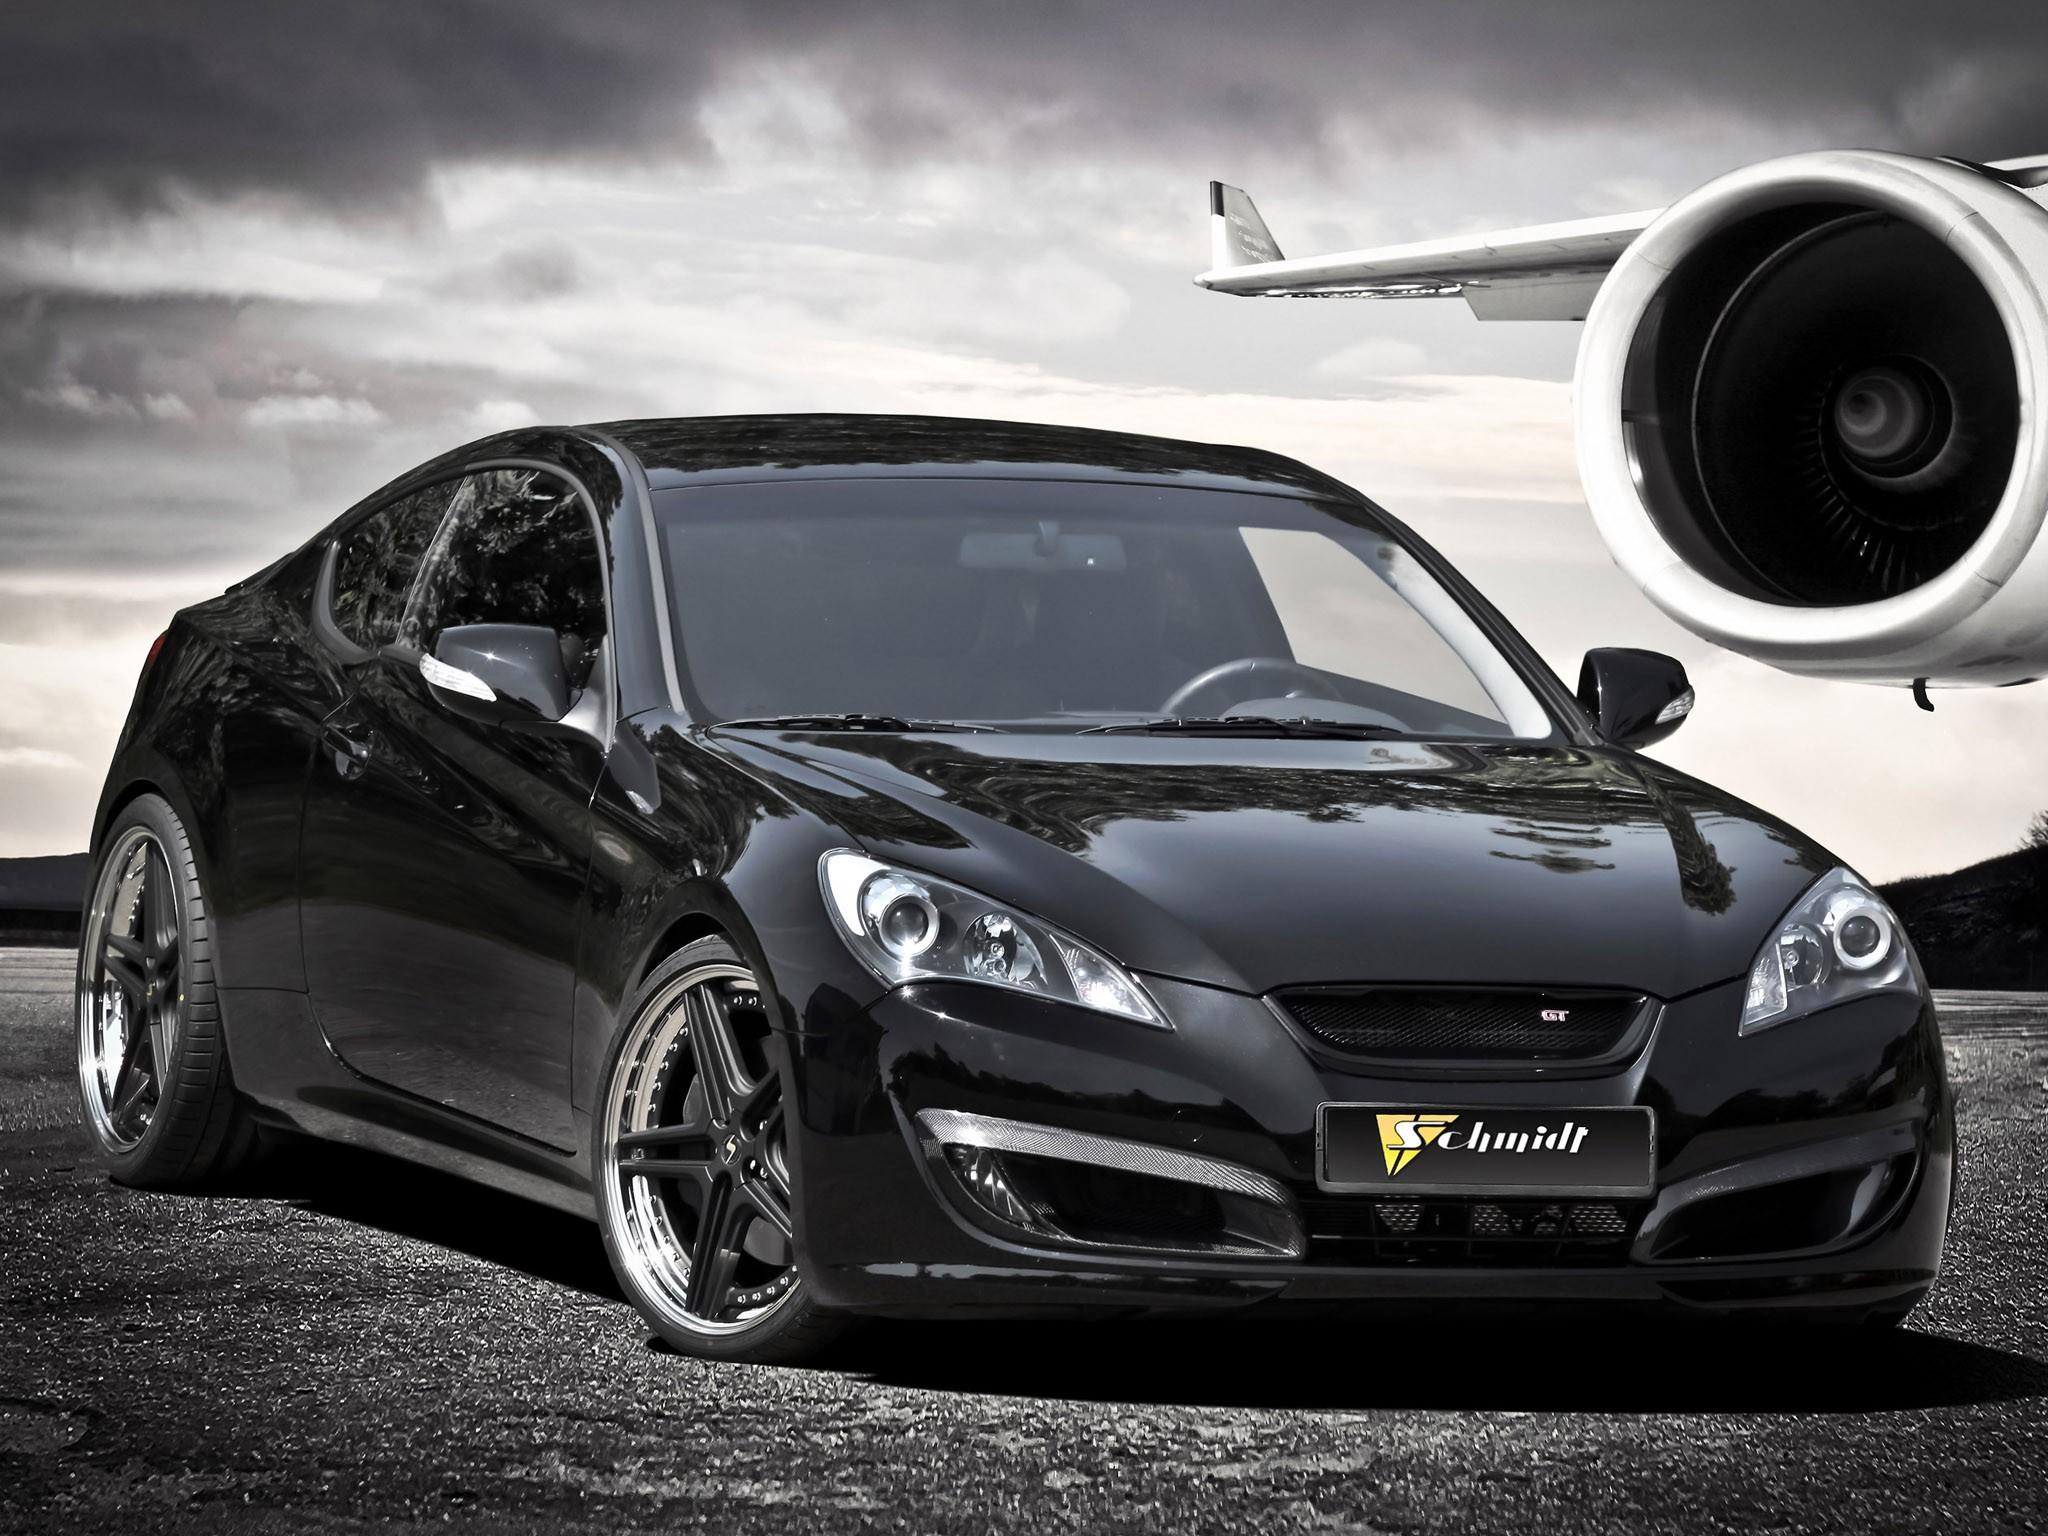 Hyundai Genesis Coupe Project Panther (2012) - Schmidt Revolution